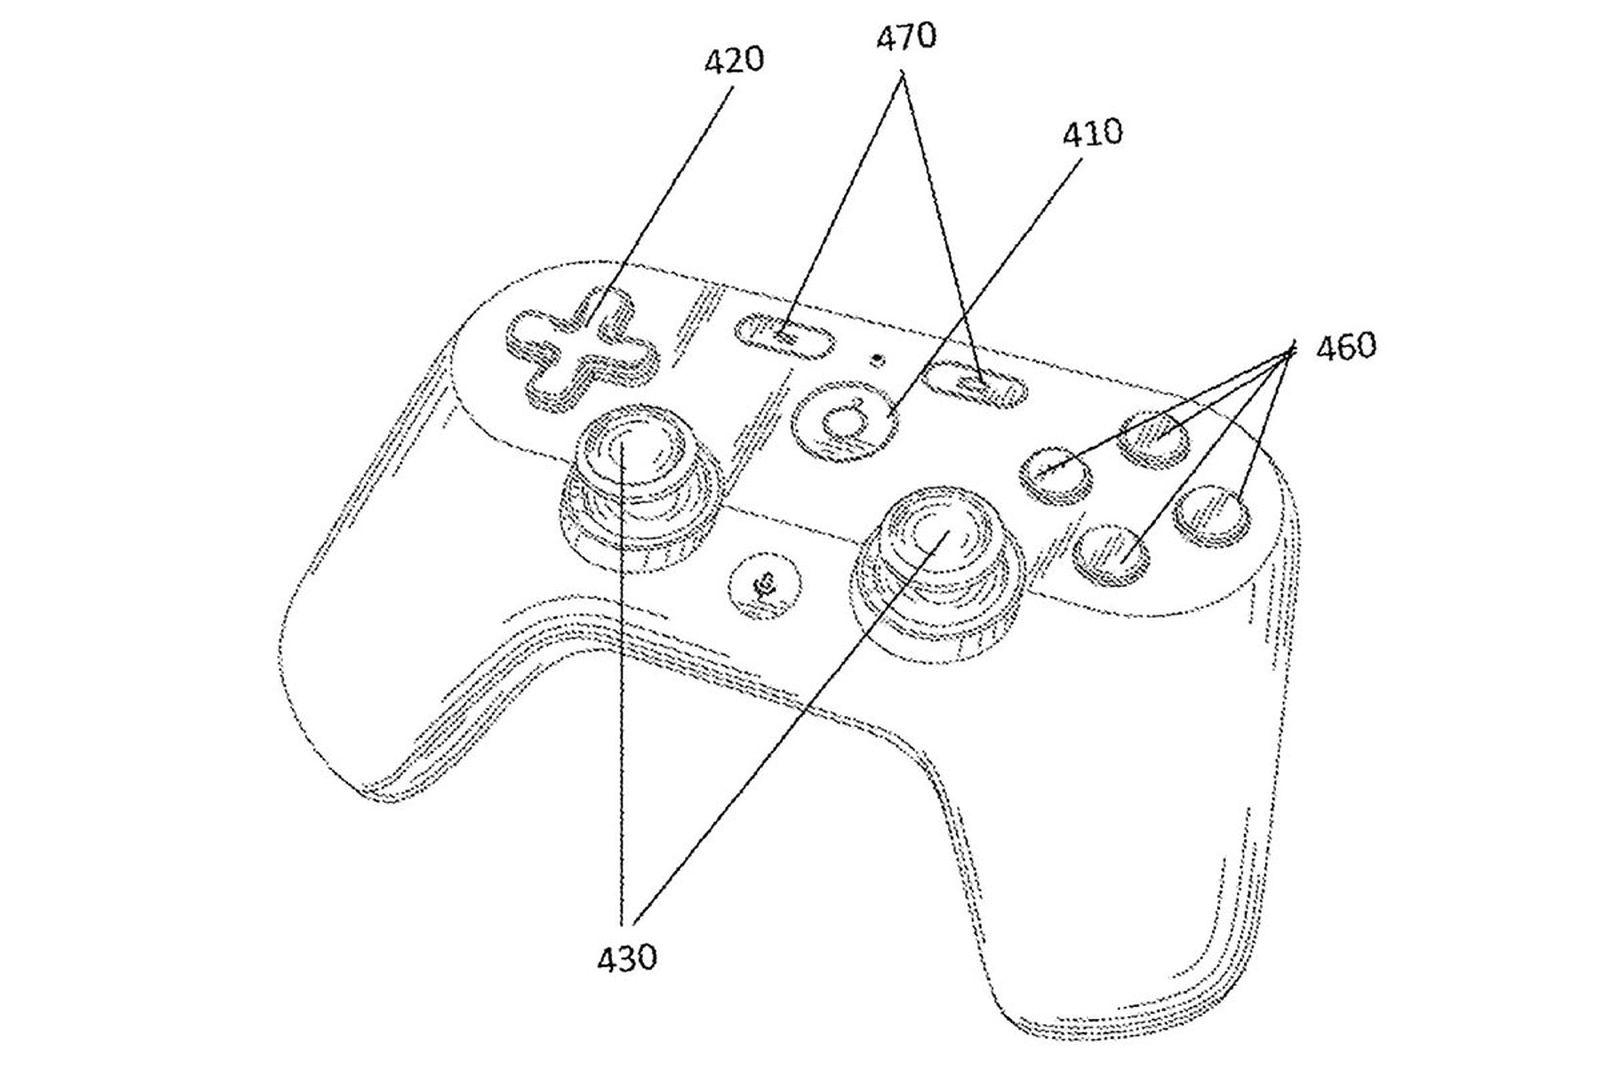 google game console rumors